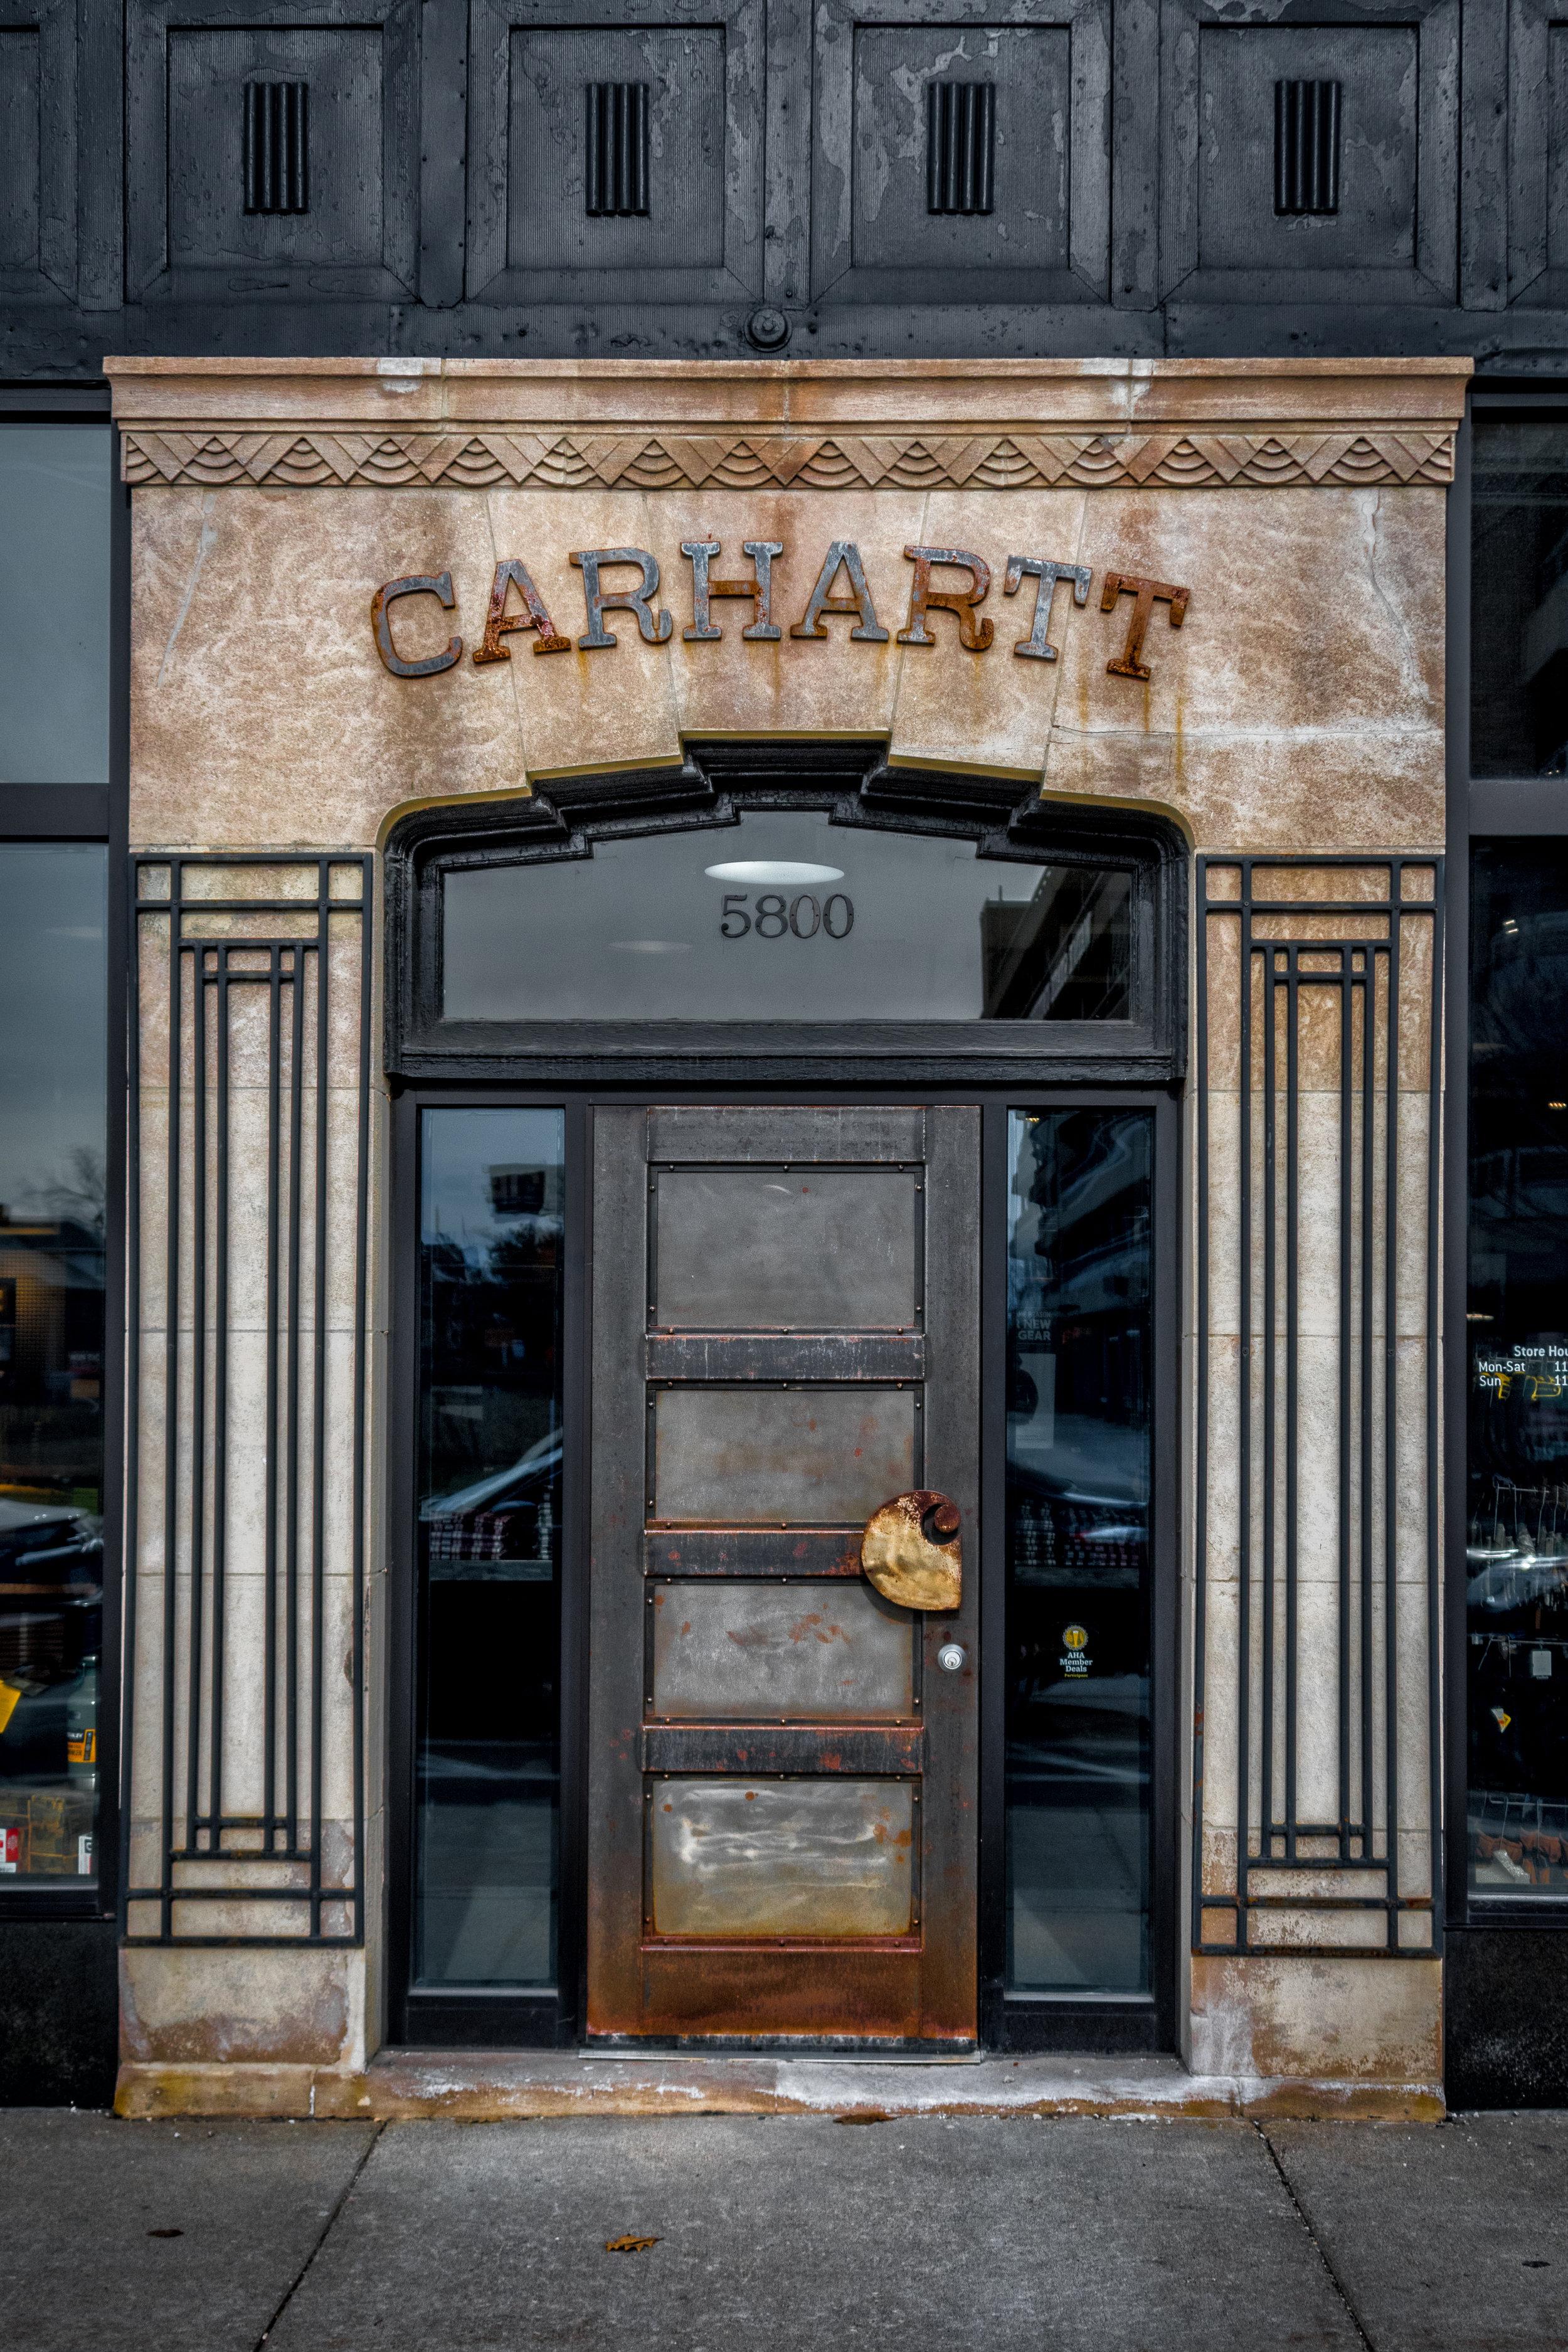 Carhartt store